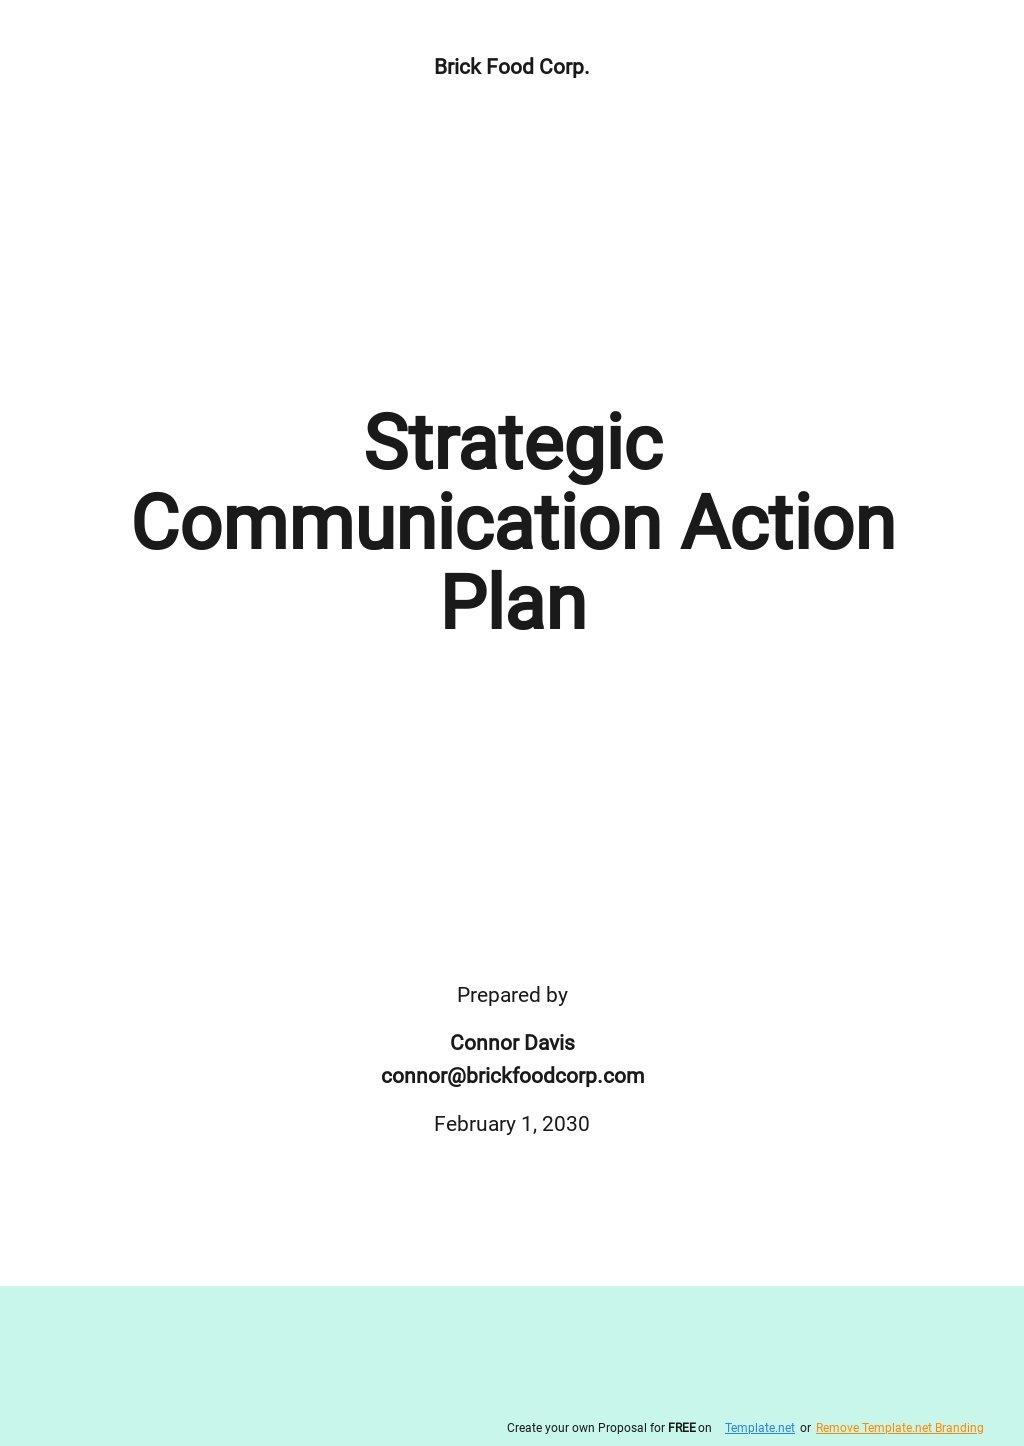 Strategic Communication Action Plan Template.jpe